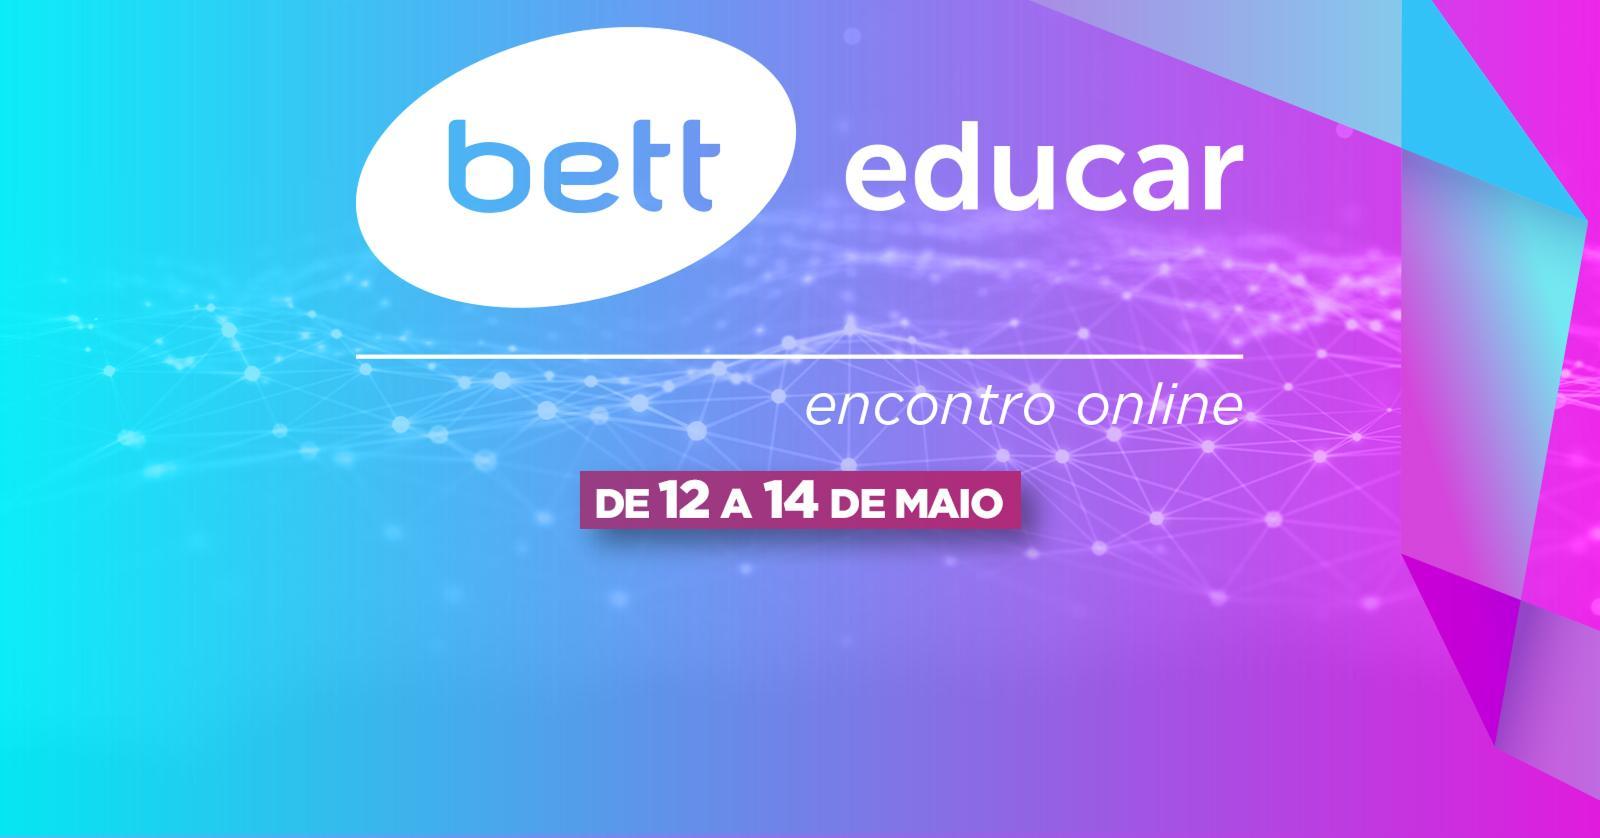 Bett Educar promove encontro online de 12 a 14 de maio